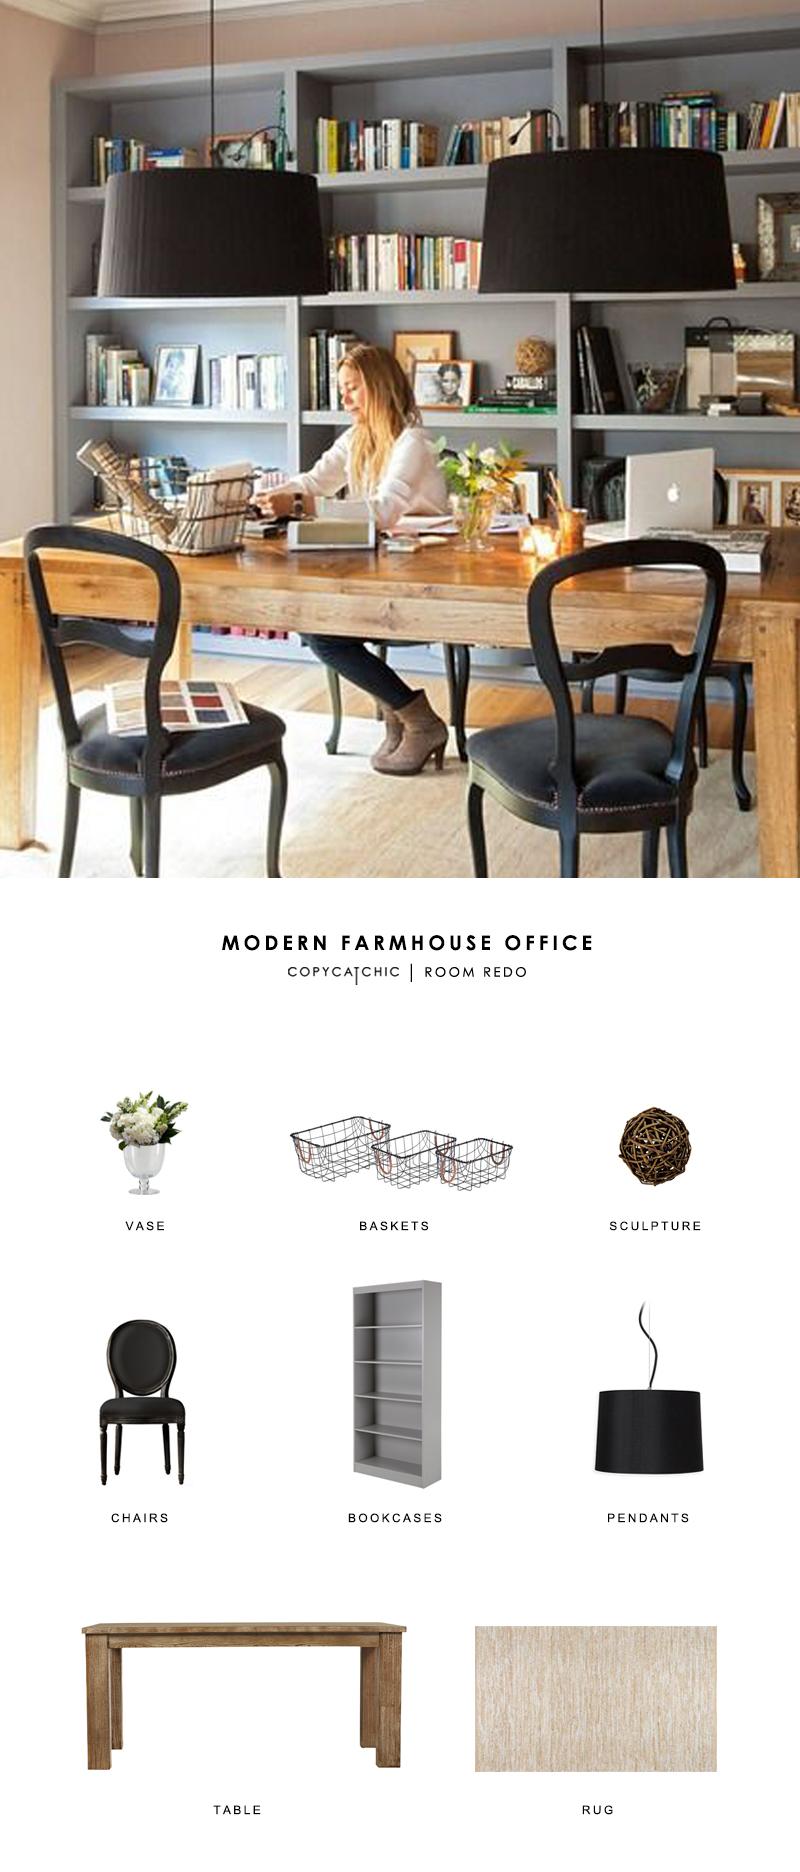 Modern Farmhouse Office Chair : modern, farmhouse, office, chair, Modern, Farmhouse, Office, Copycatchic